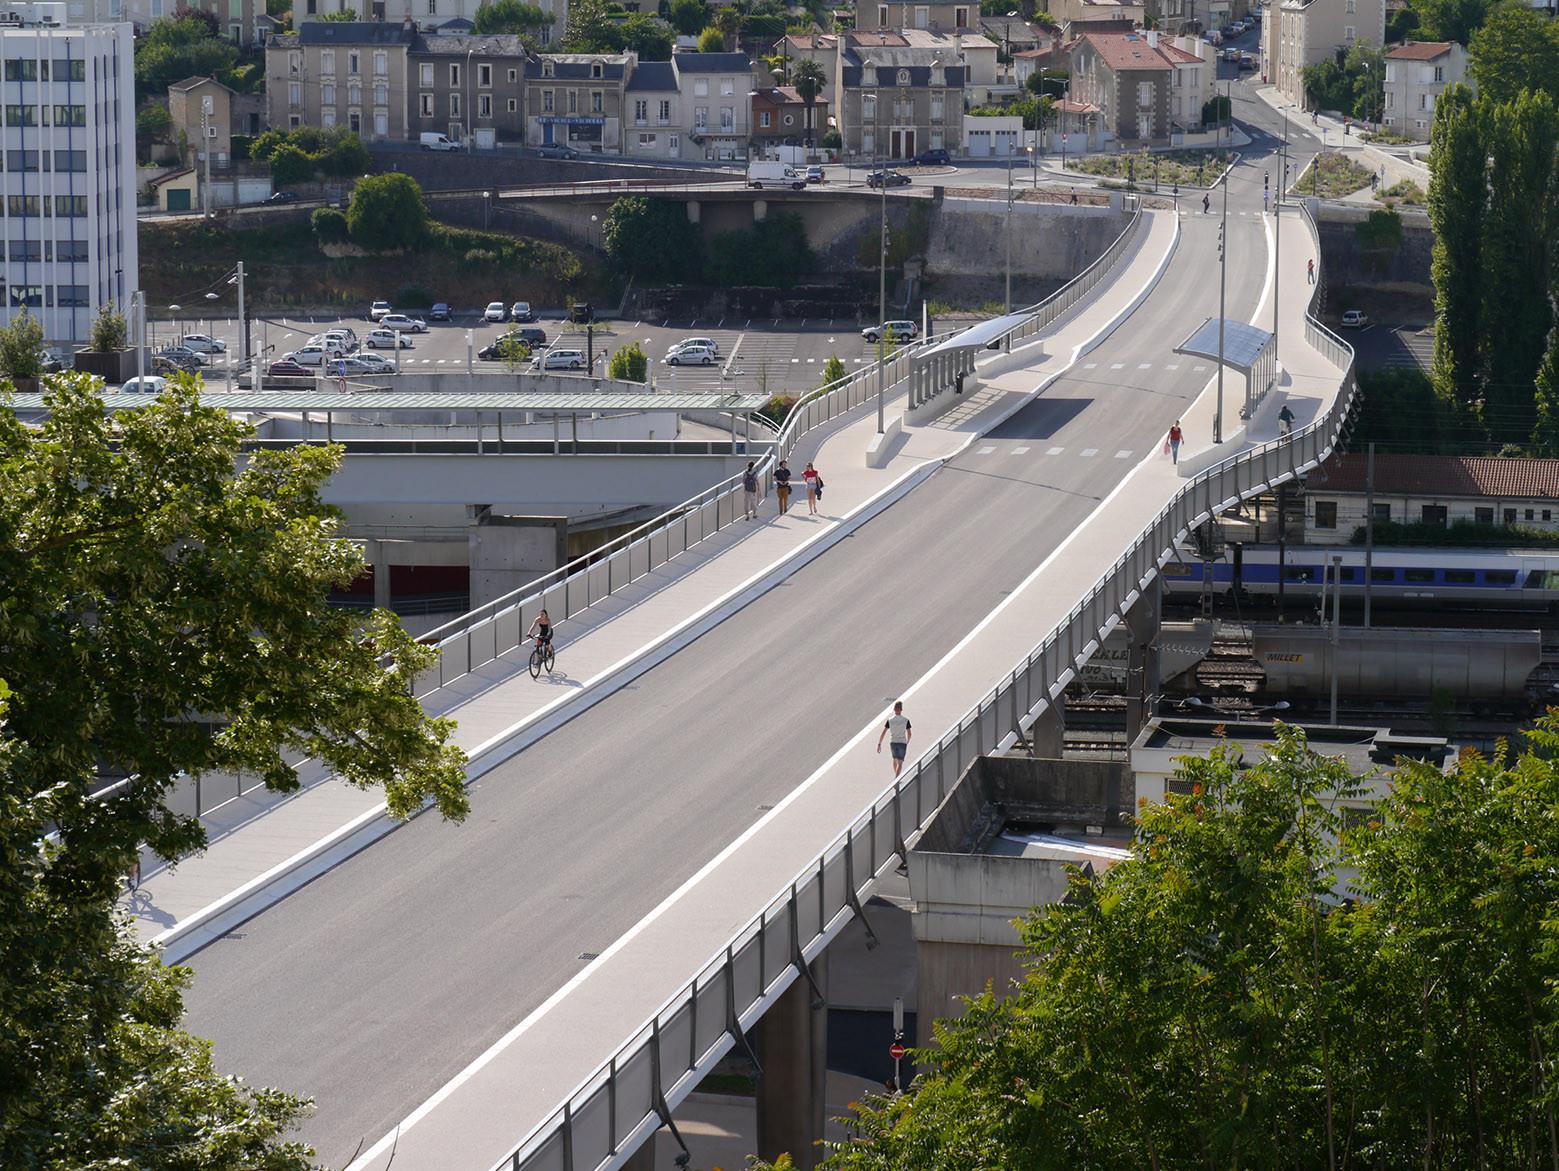 Léon Blum Viaduct Bridge / RFR, Courtesy of RFR